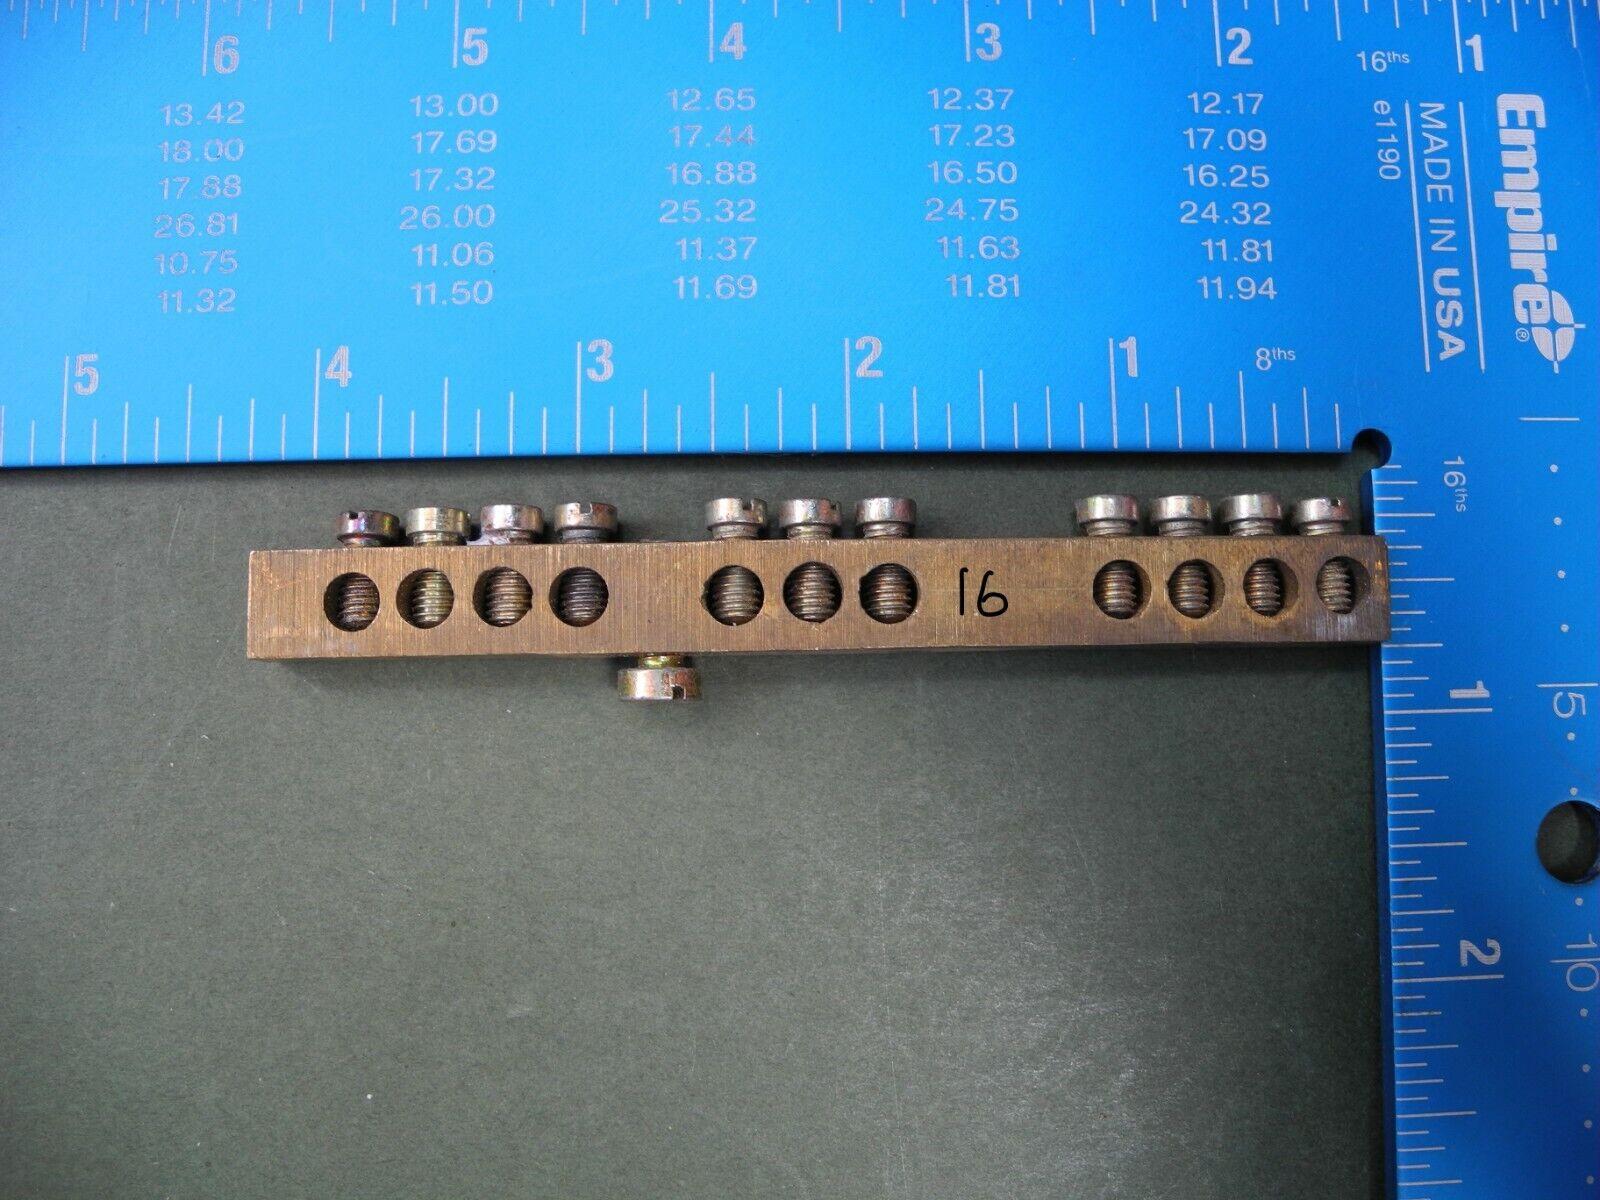 Earth Bonding Brass Multi Connection Terminal Connectors,3w,7w,9w,10w,11w,15w